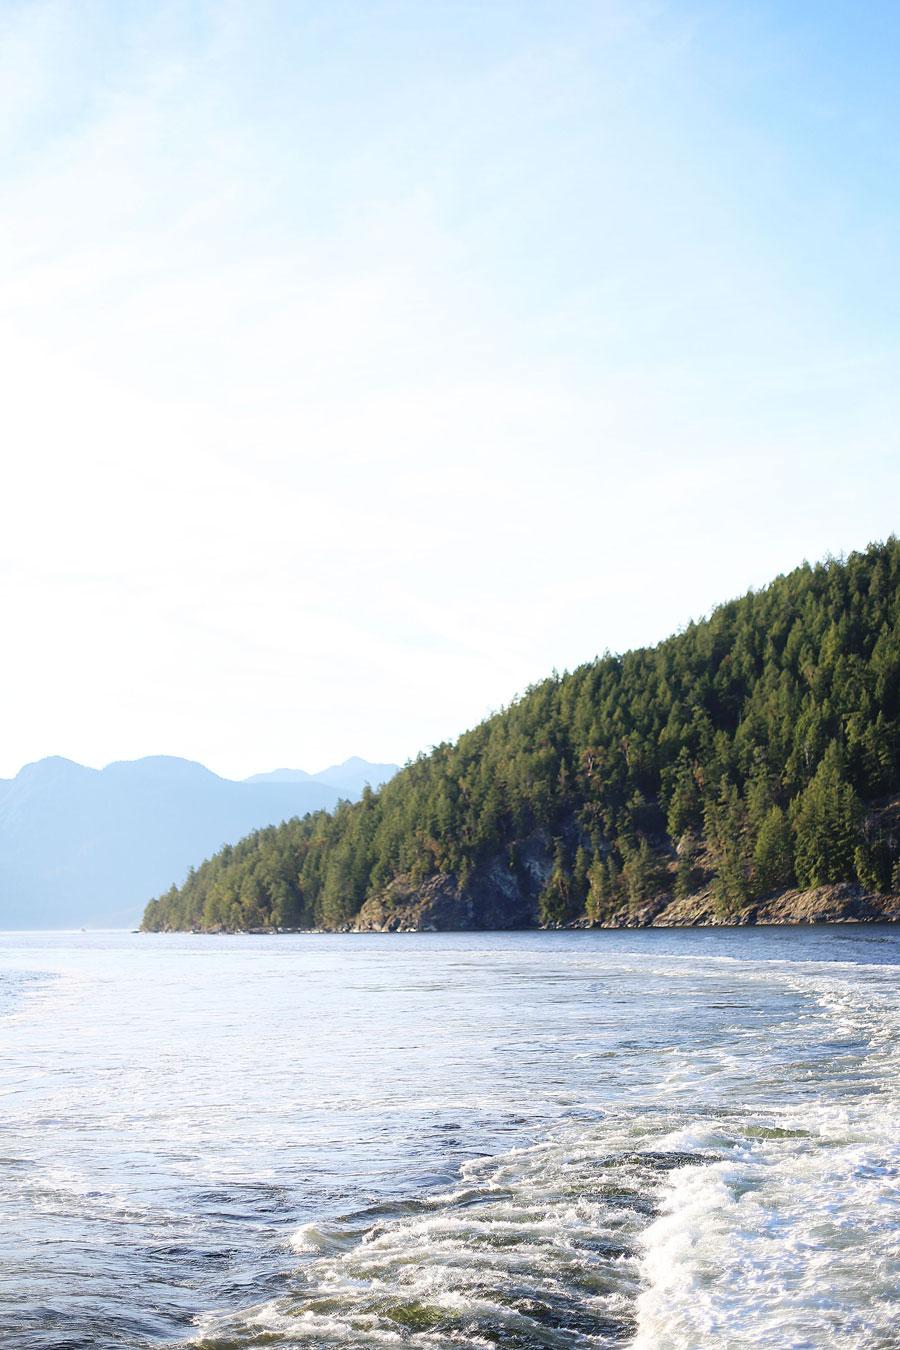 Travel tips to the Sunshine Coast, Canada